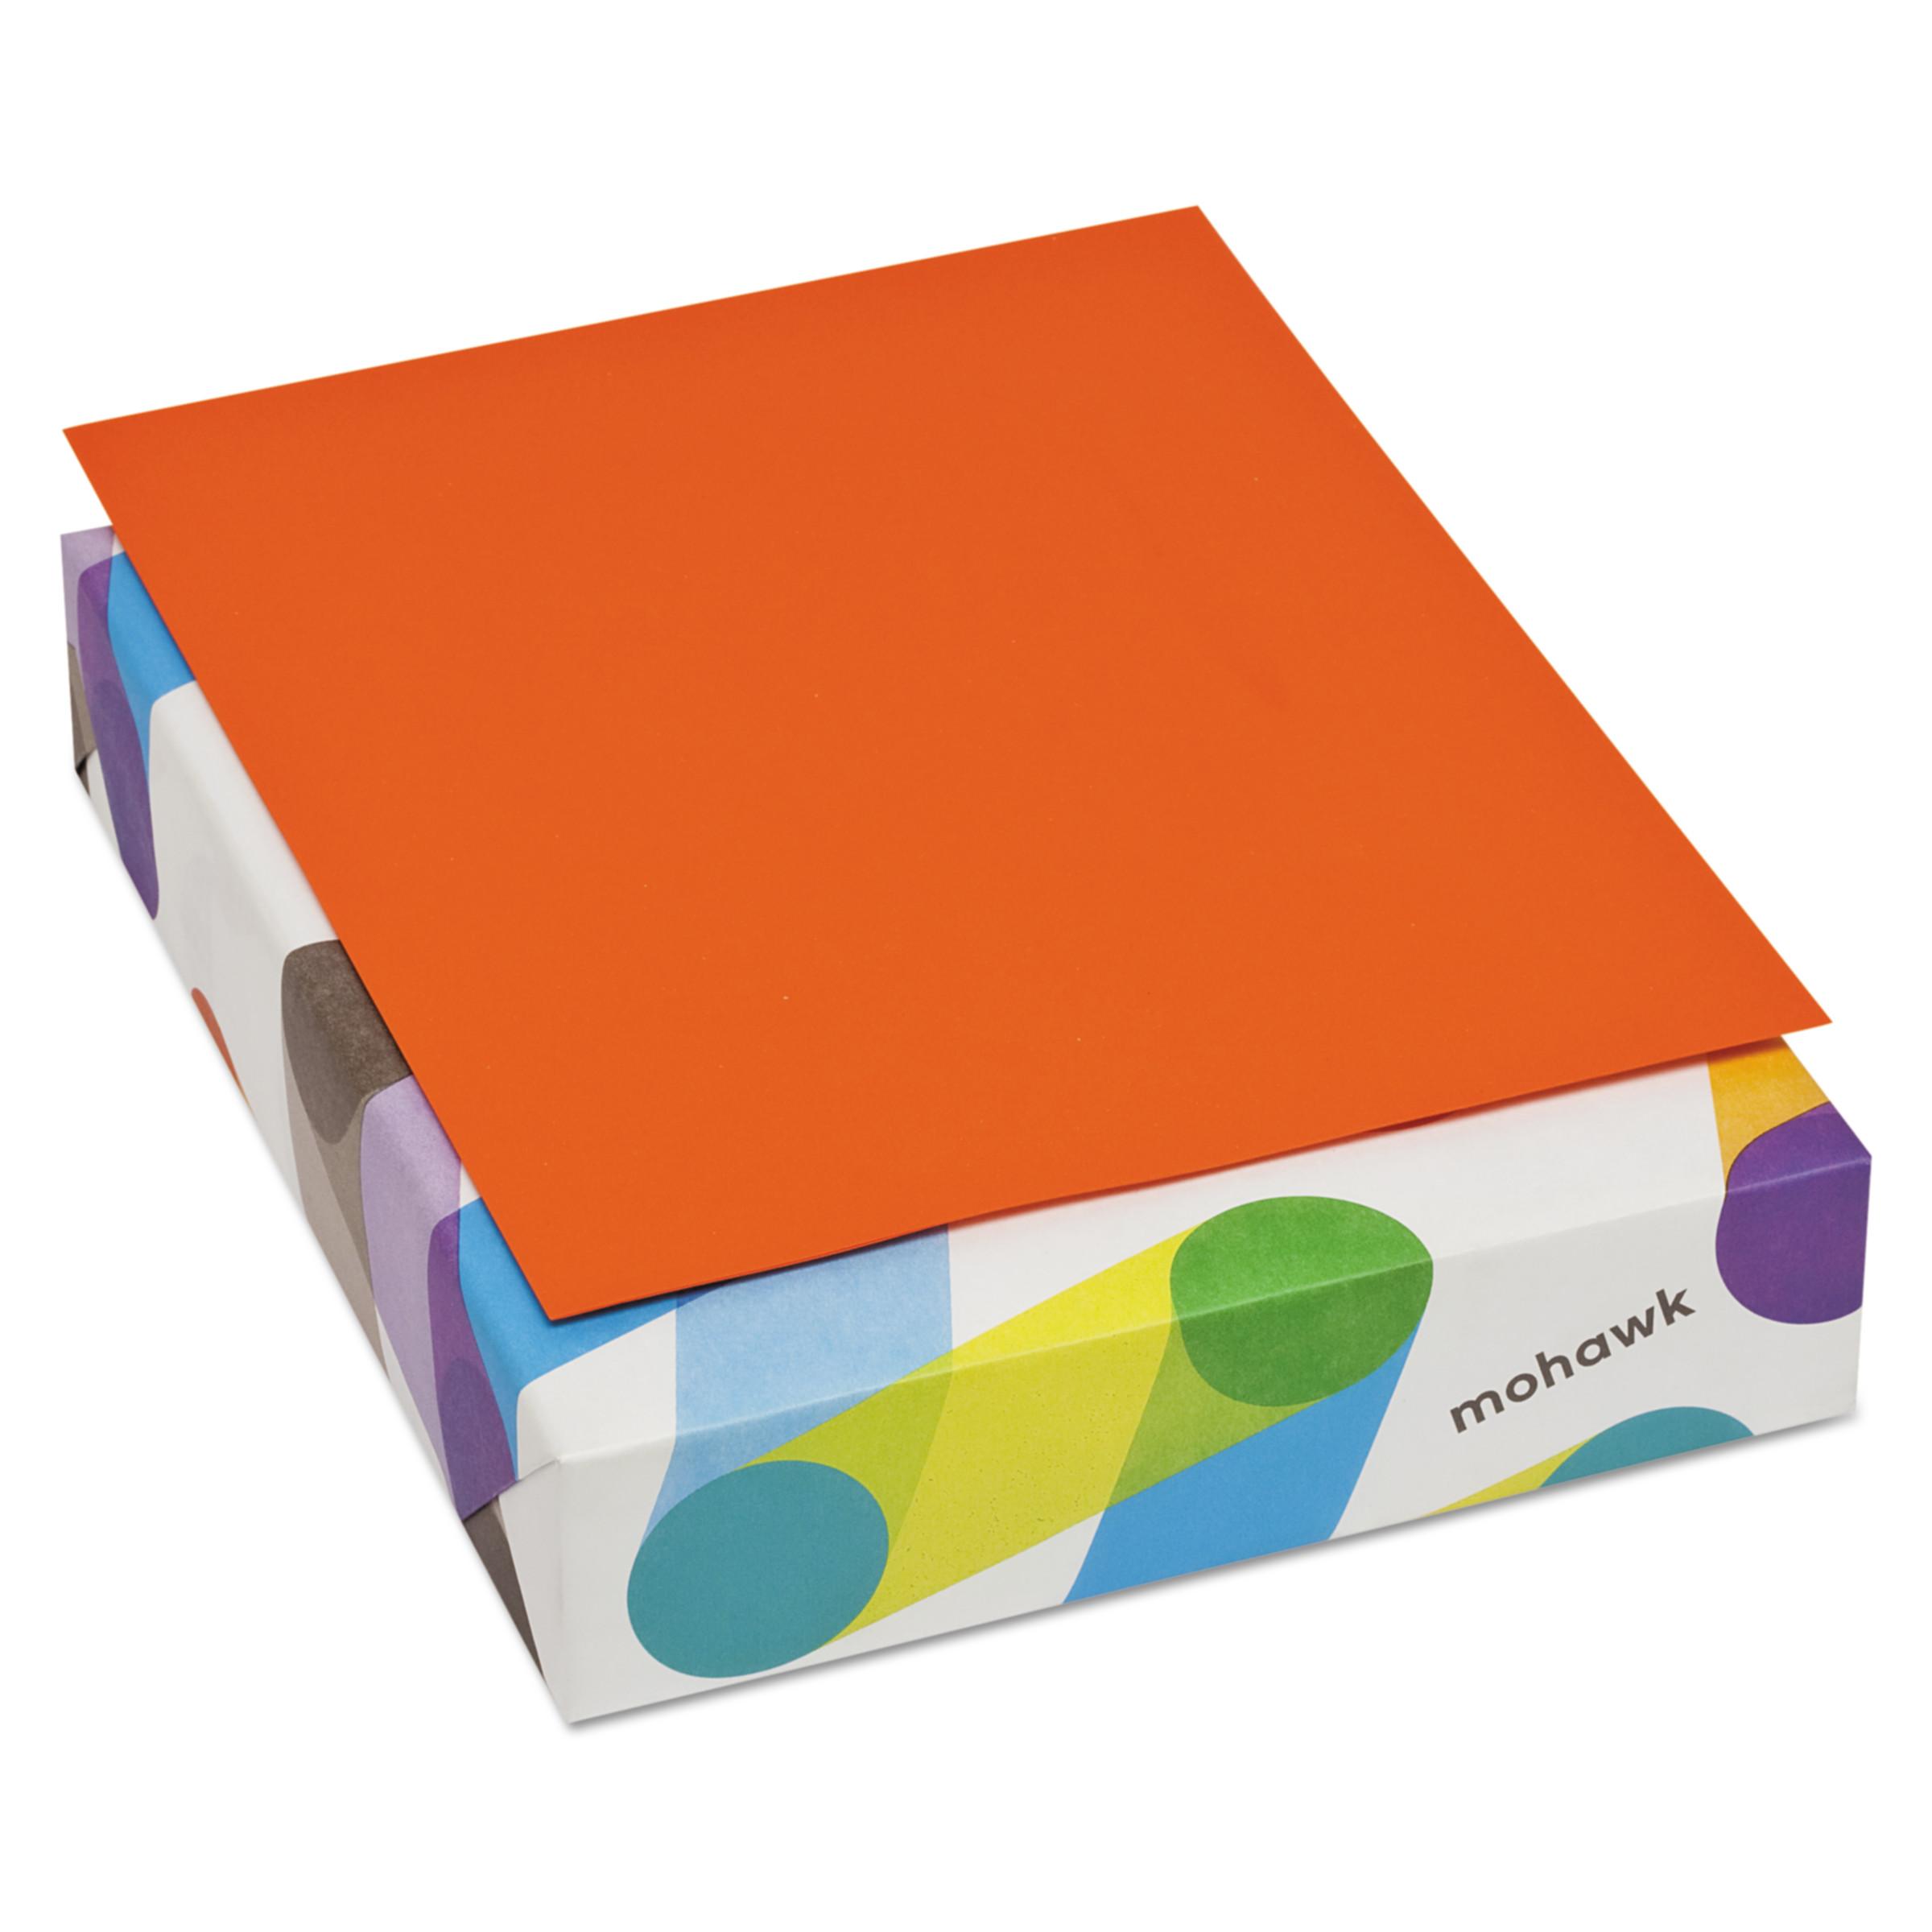 Mohawk BriteHue Multipurpose Colored Paper, 20lb, 8 1/2 x 11, Orange, 500 Sheets -MOW472608